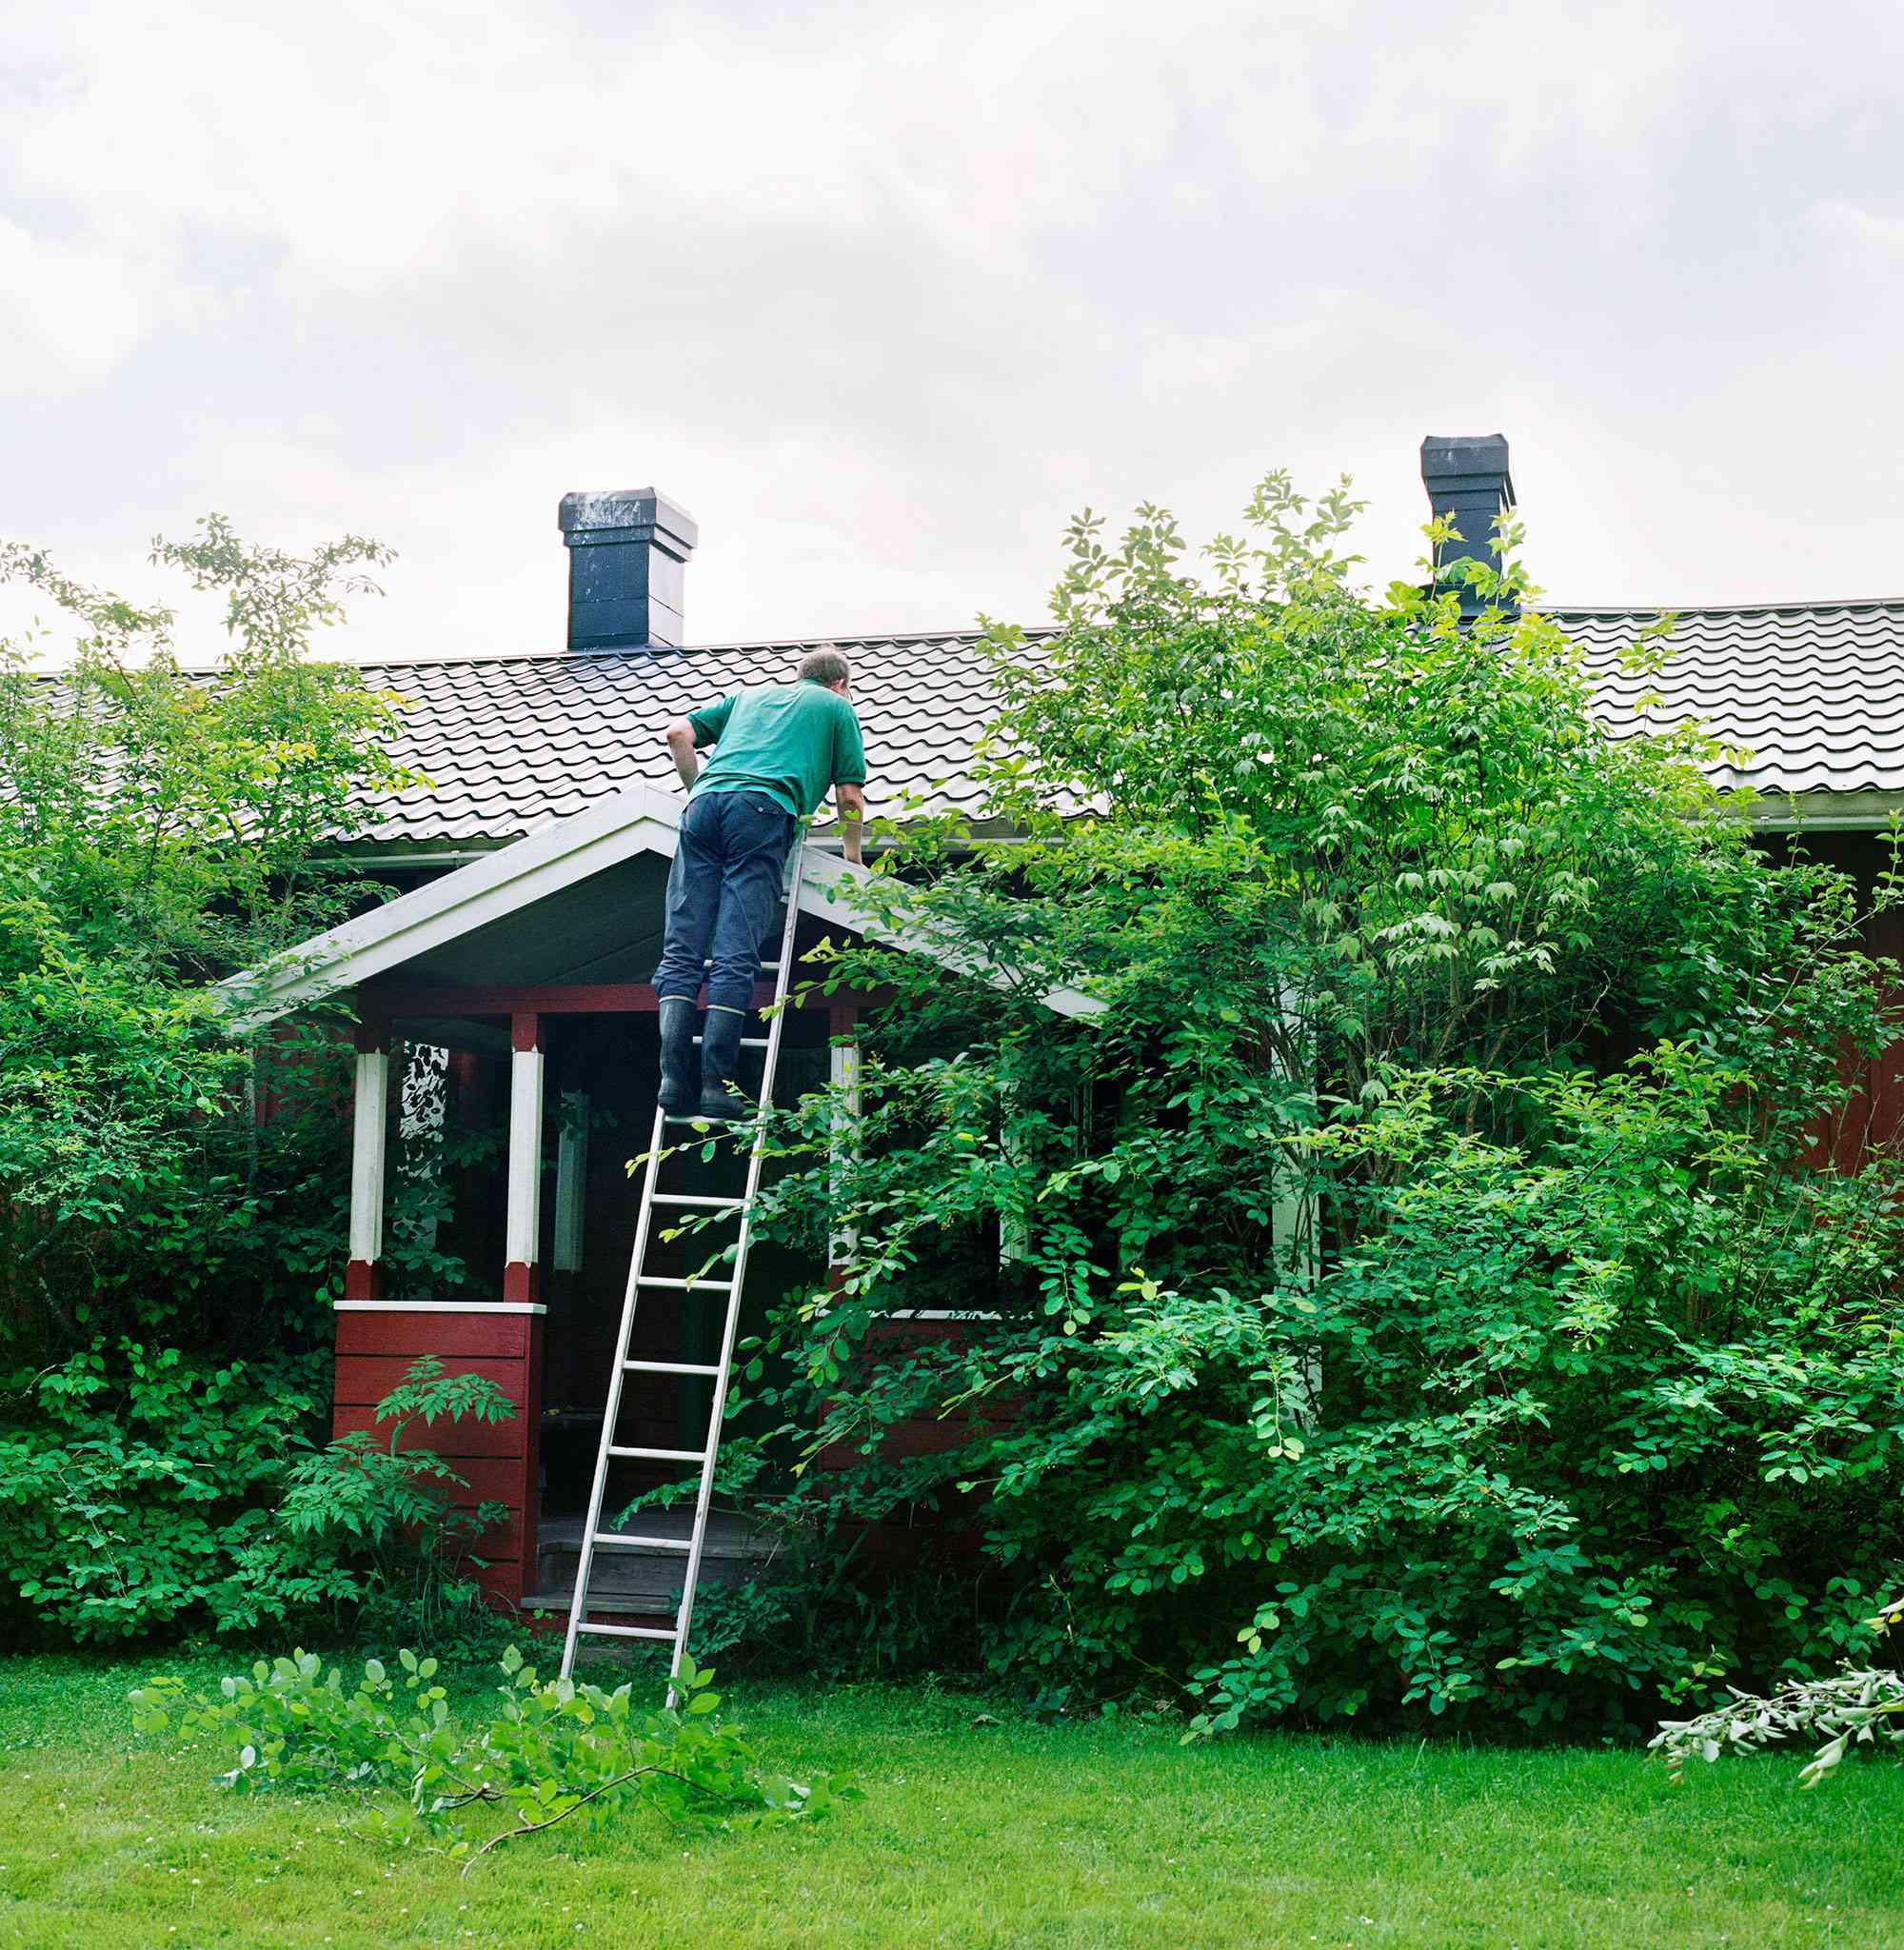 Man climbing ladder to roof